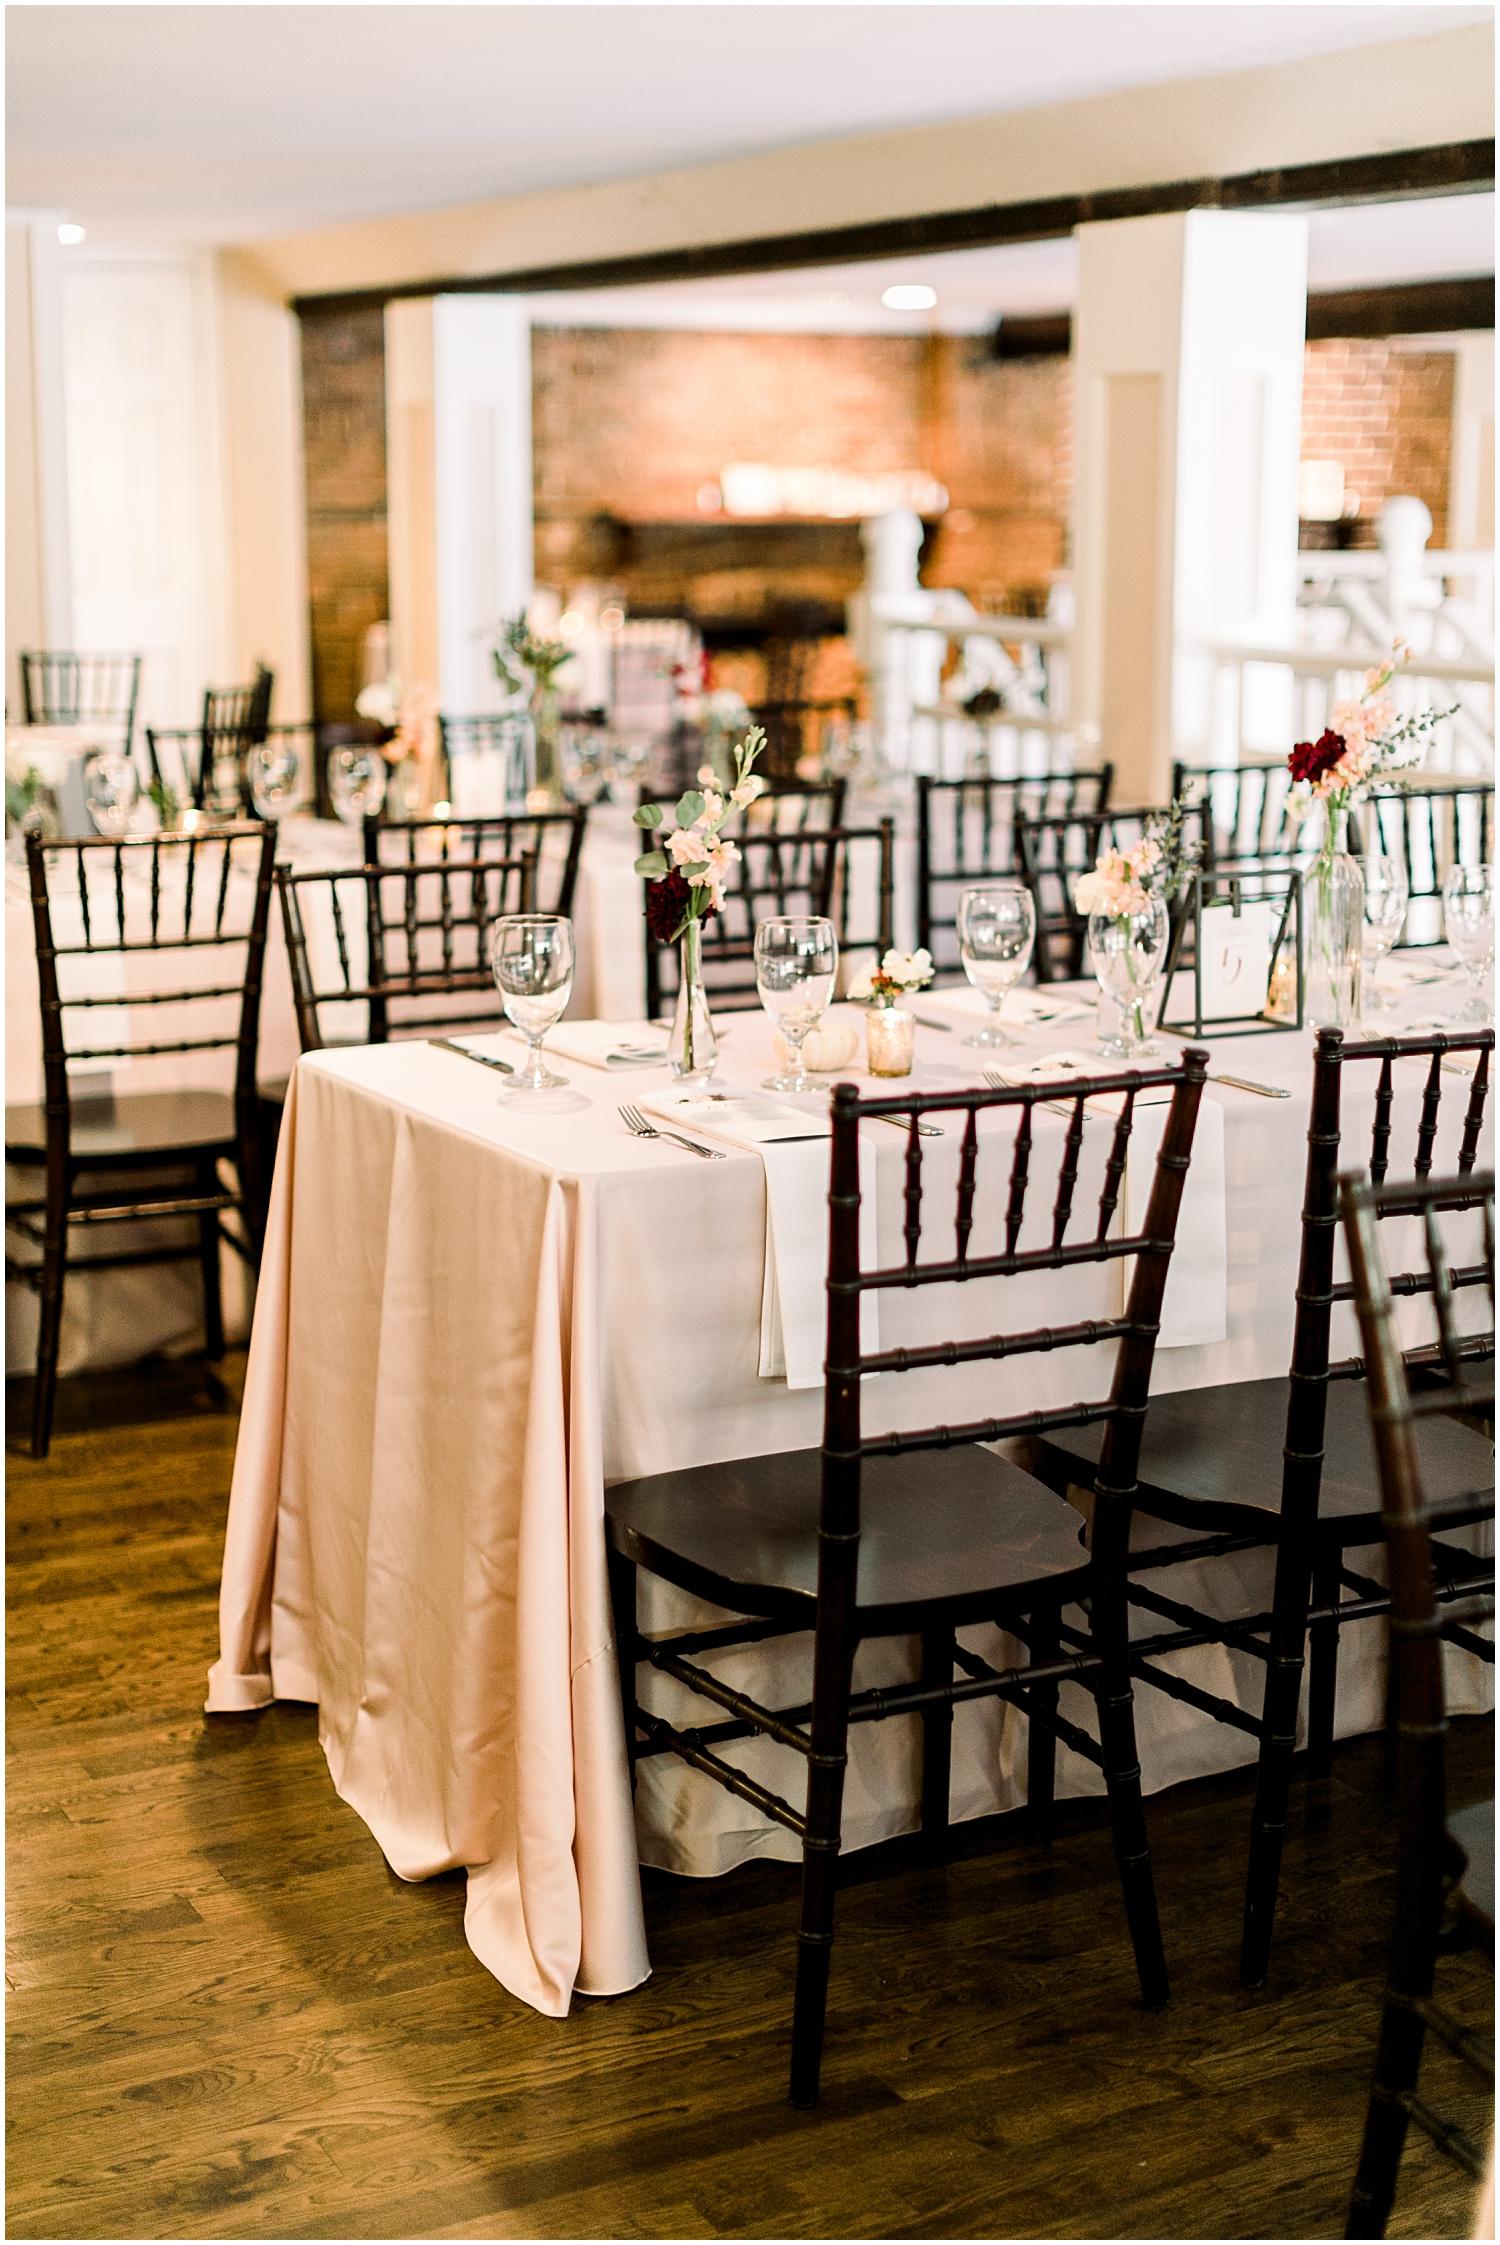 128 South Wedding venue, Downtown Wilmington NC Wedding_Erin L. Taylor Photography_0046.jpg